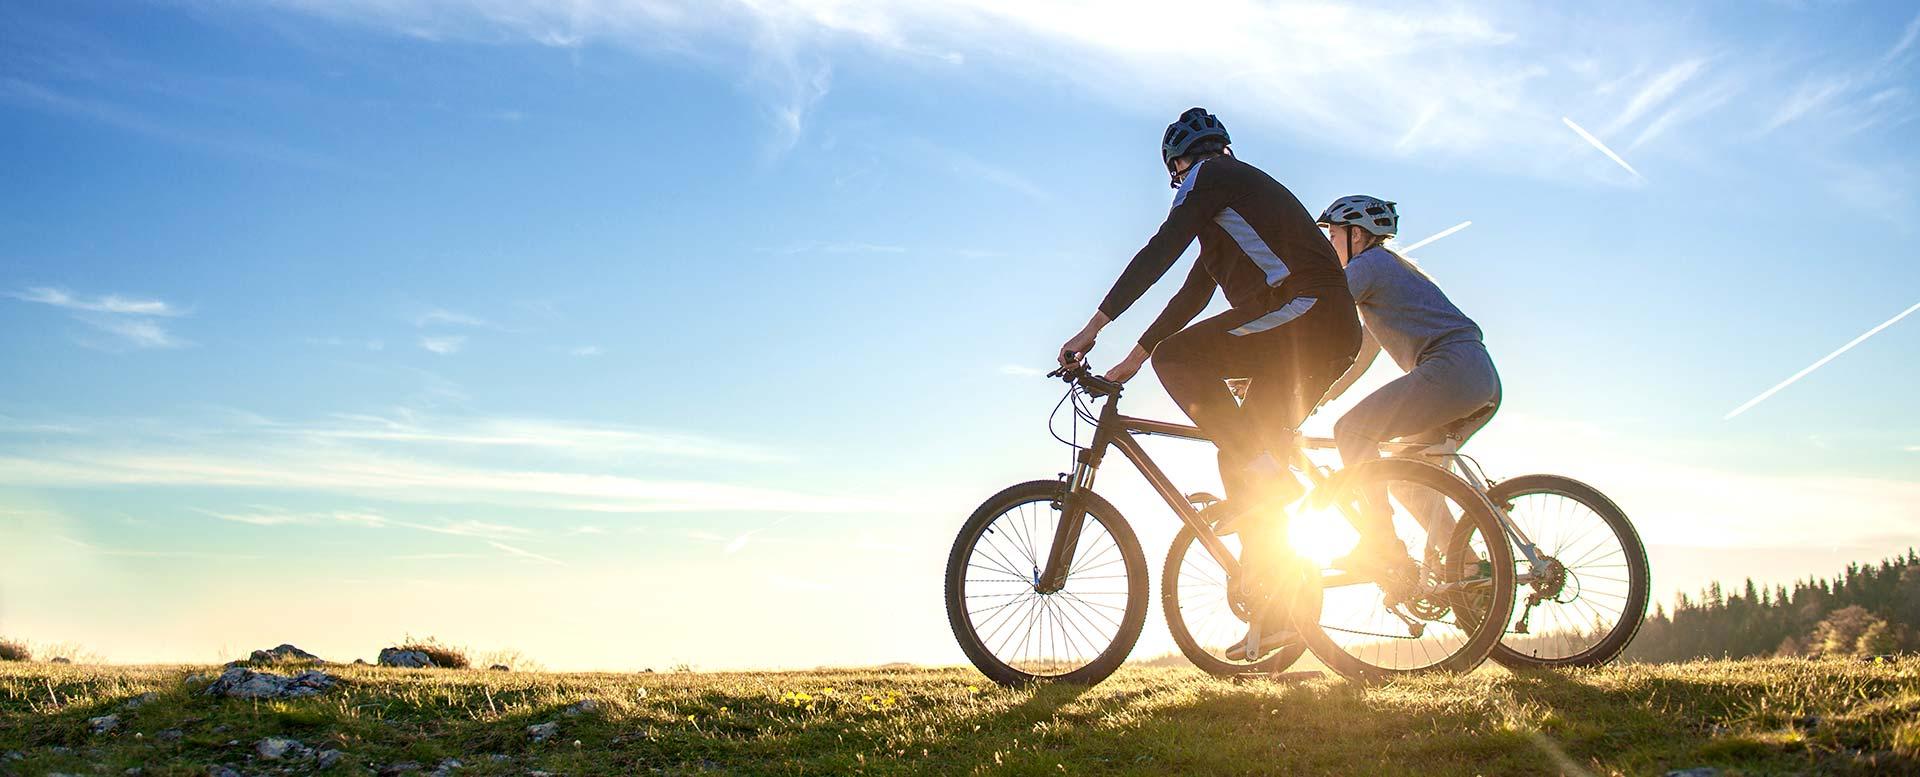 Fahrradfahrer mit Fahrradhelmen